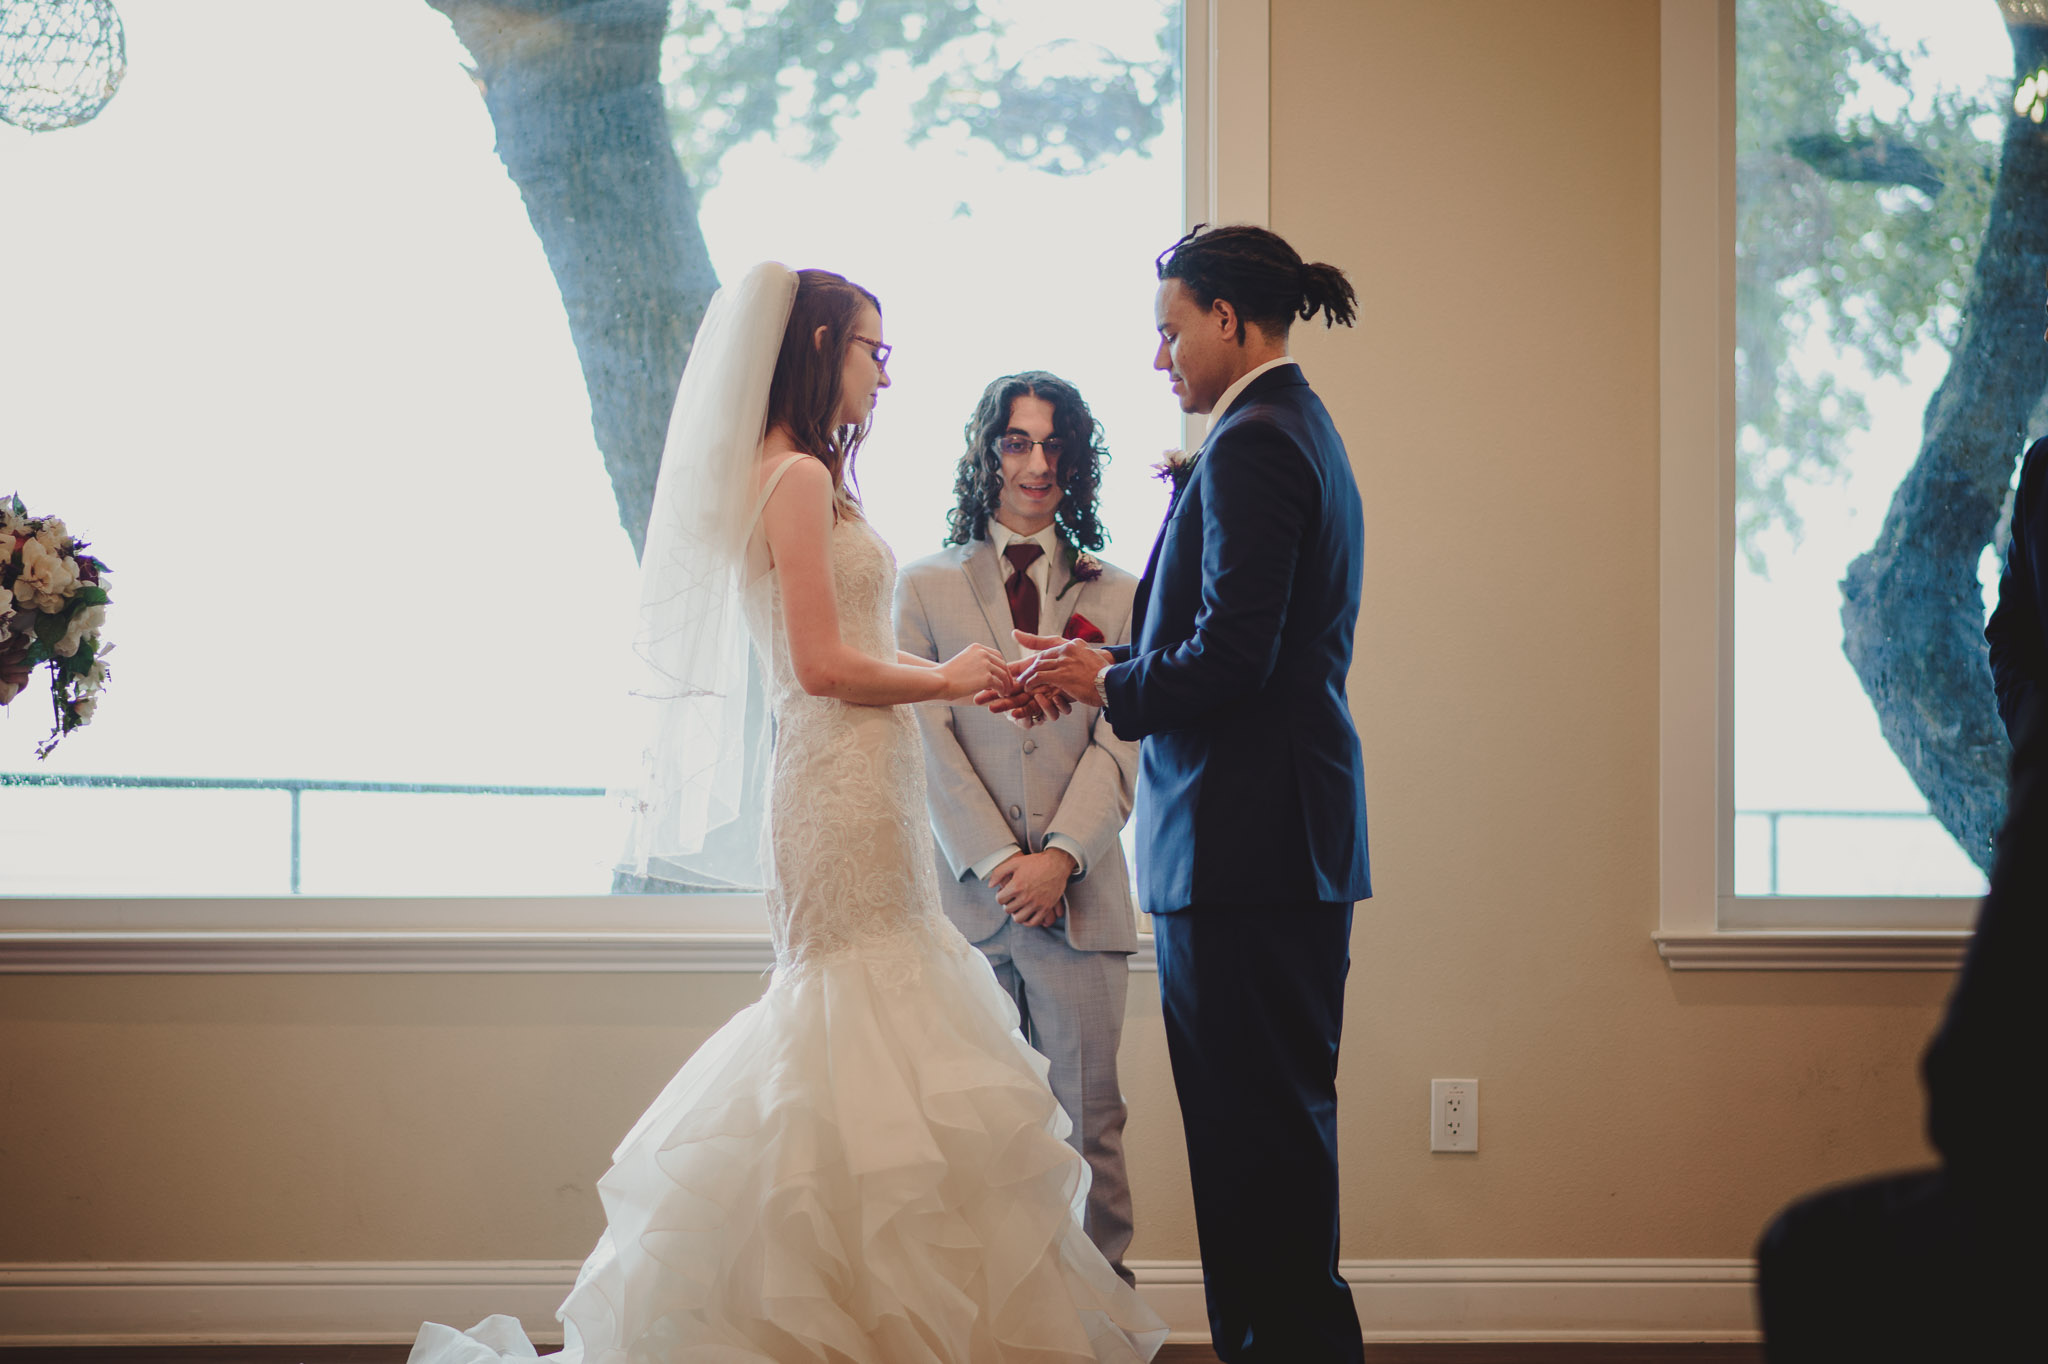 Austin-Texas-Wedding-Vintage-Villas-0029.jpg